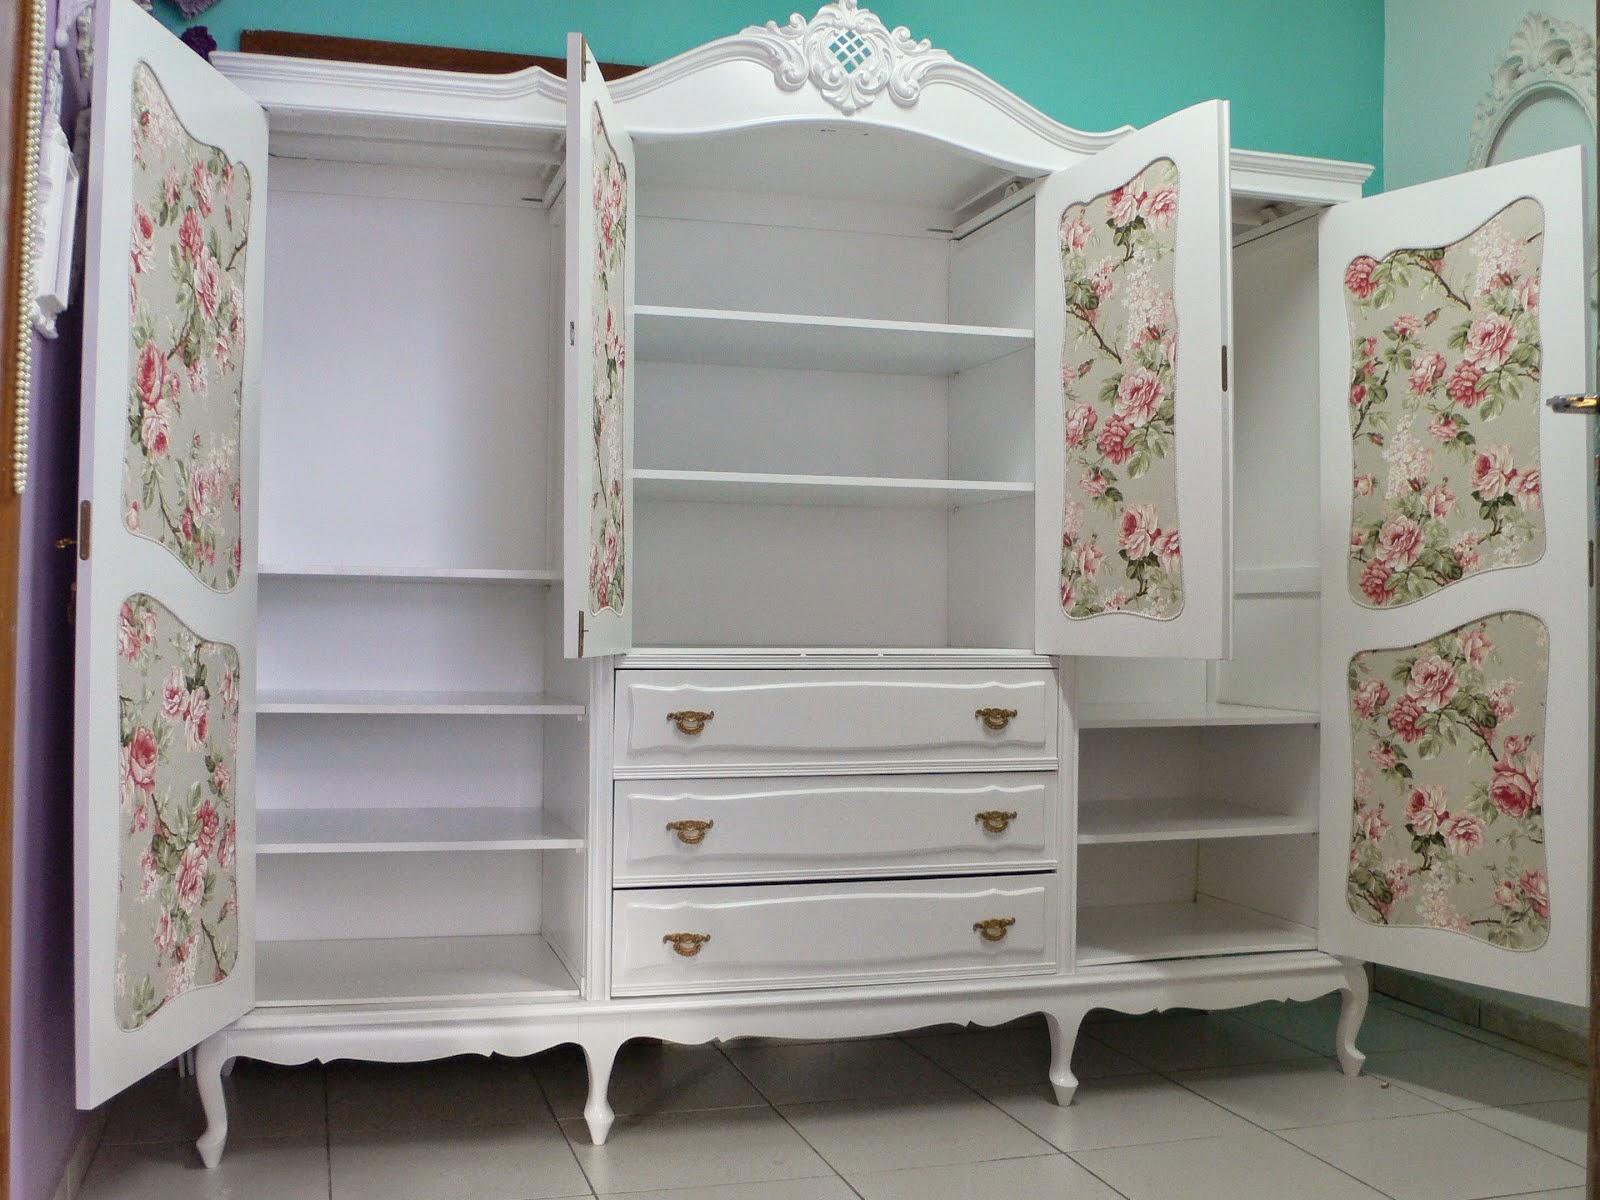 guarda-roupas-provencal-branco-ateliando-11